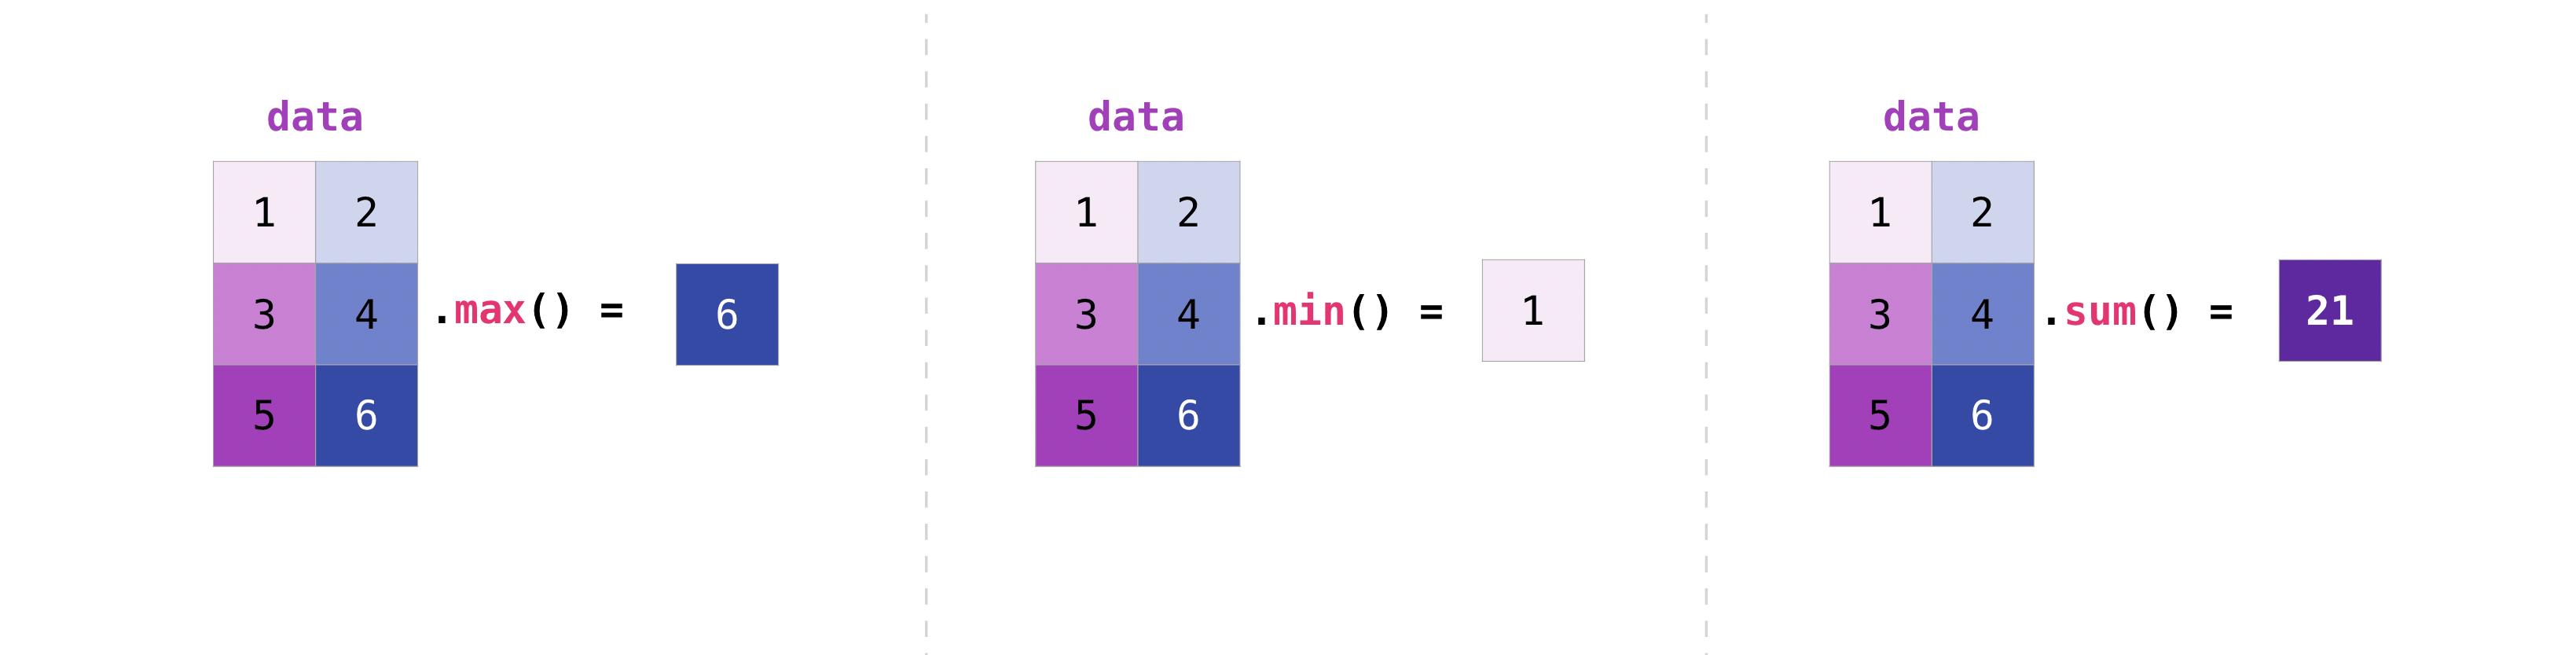 ../_images/np_matrix_aggregation.png